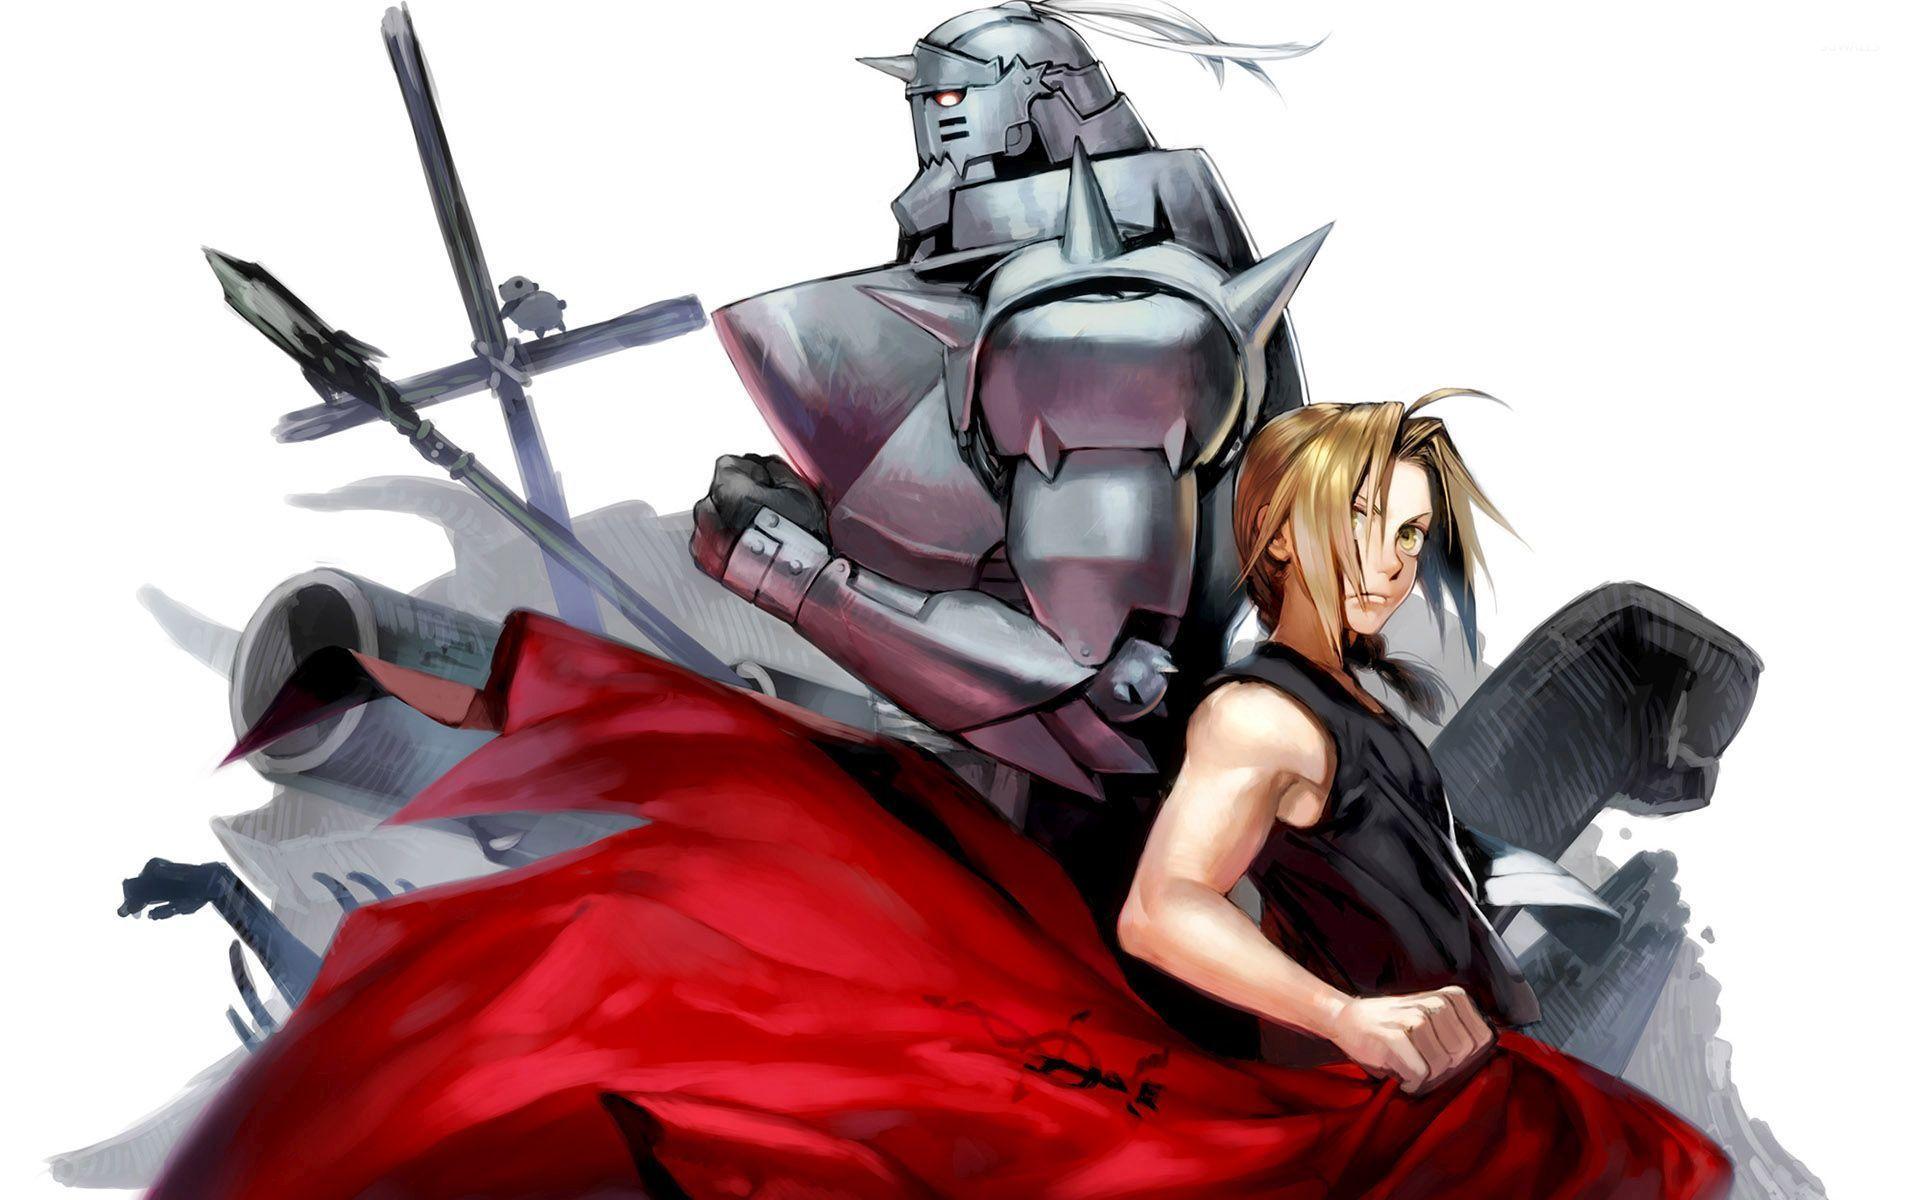 Fma Wallpaper Quotes Edward Elric Fullmetal Alchemist Wallpaper Anime